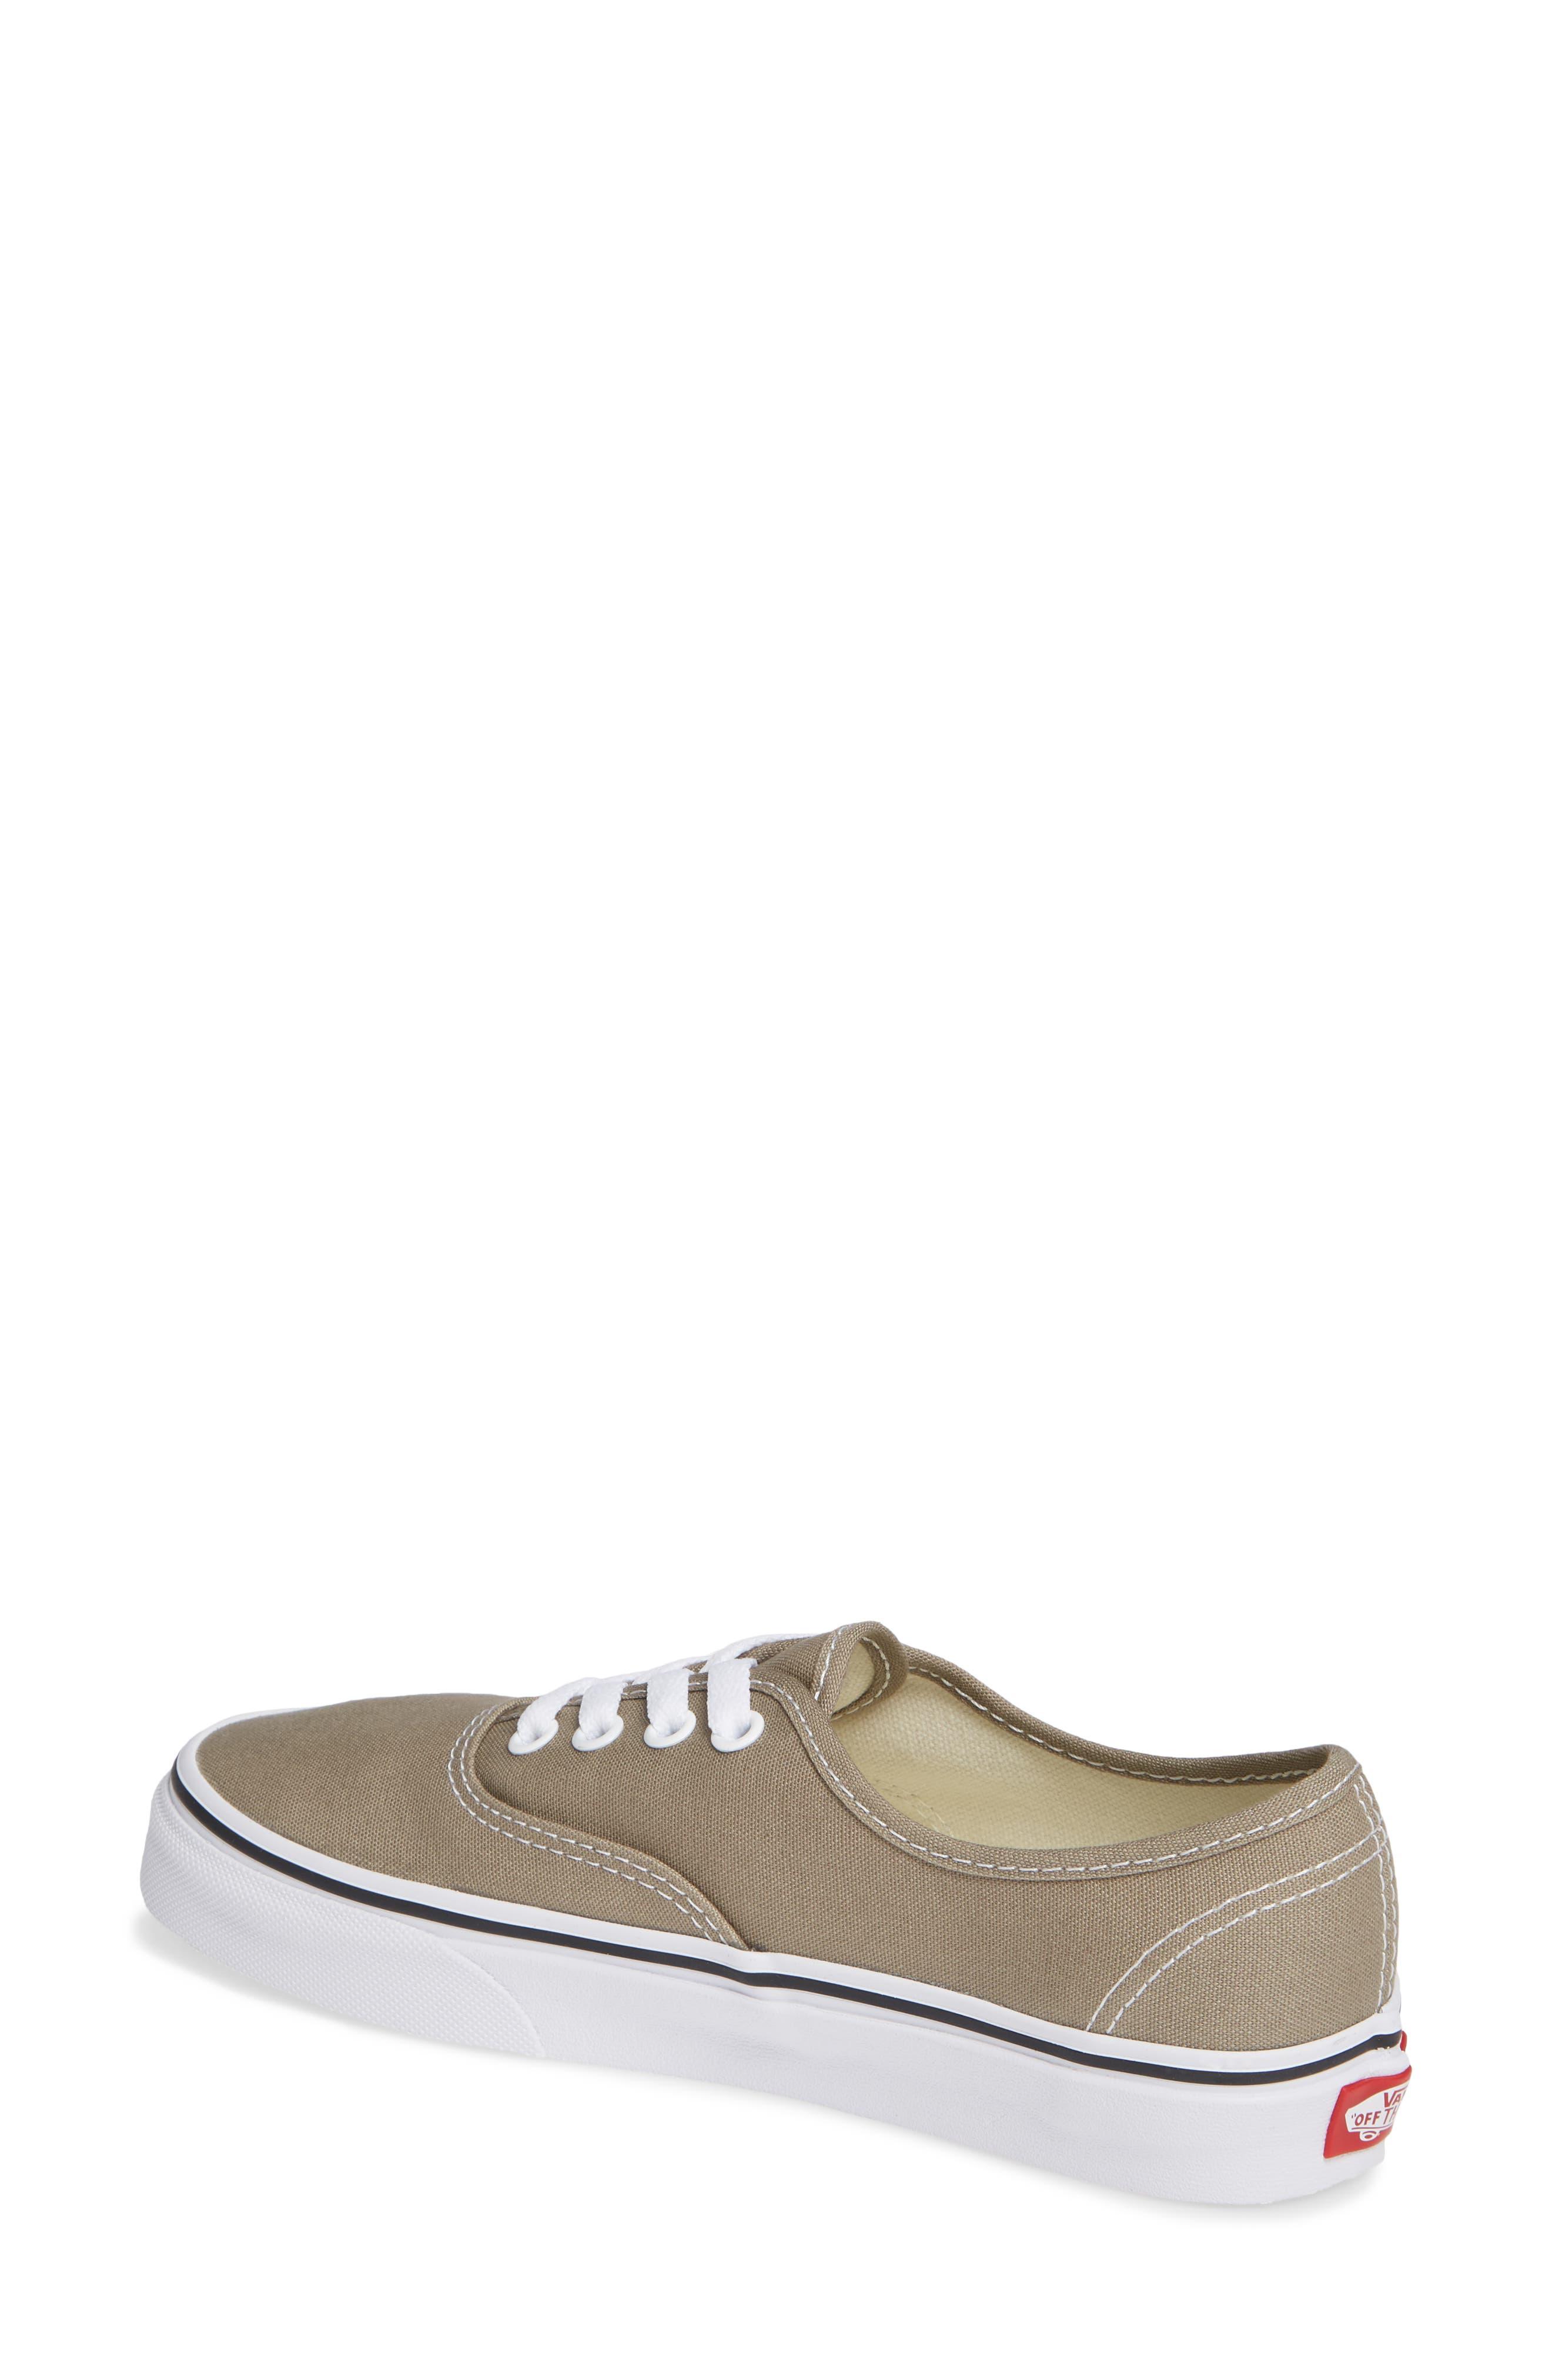 ,                             'Authentic' Sneaker,                             Alternate thumbnail 232, color,                             252